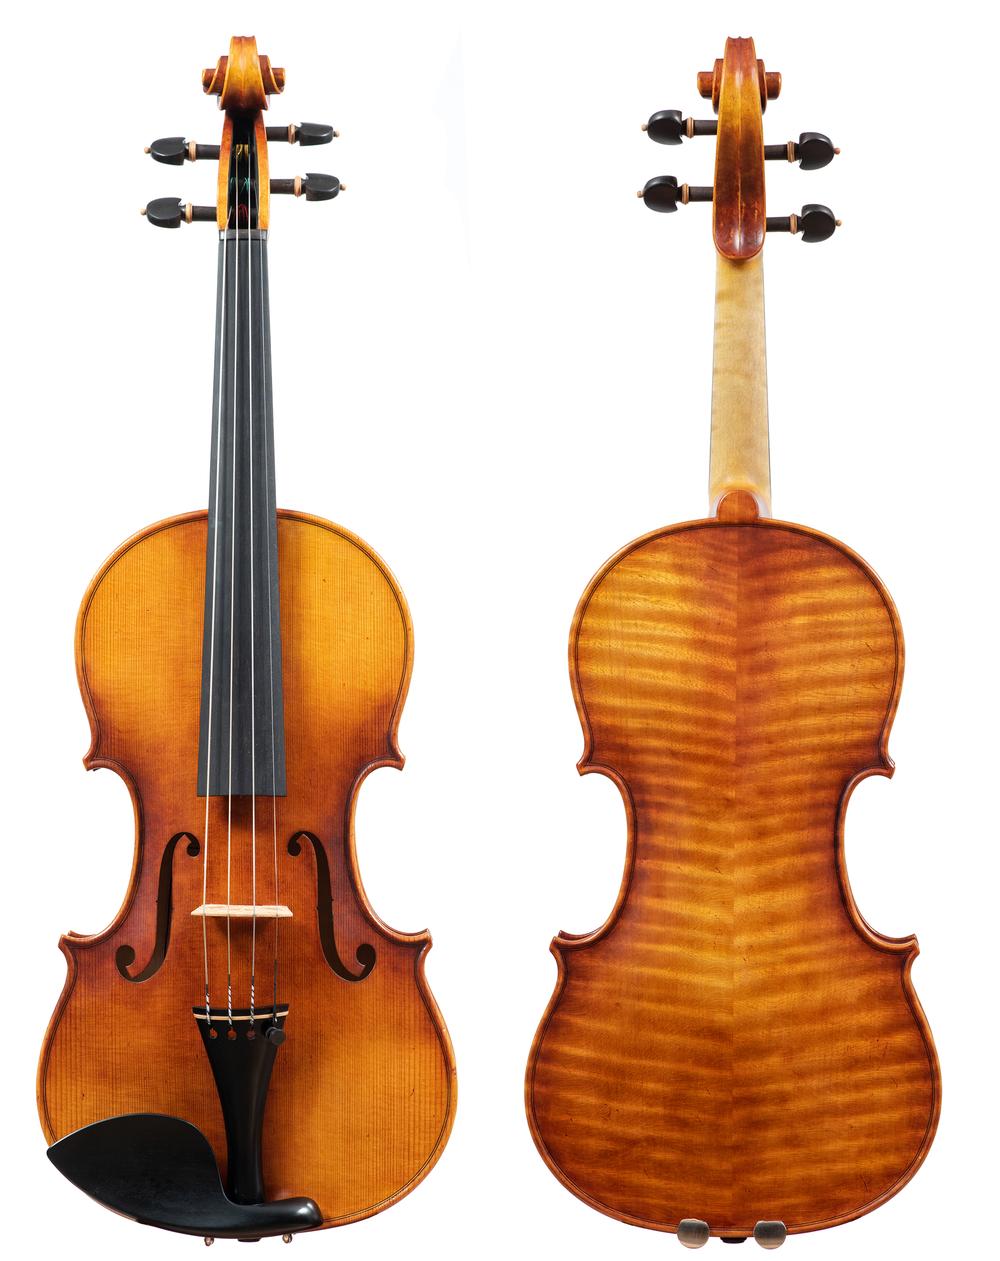 Copy of Bandila Virgil Violin